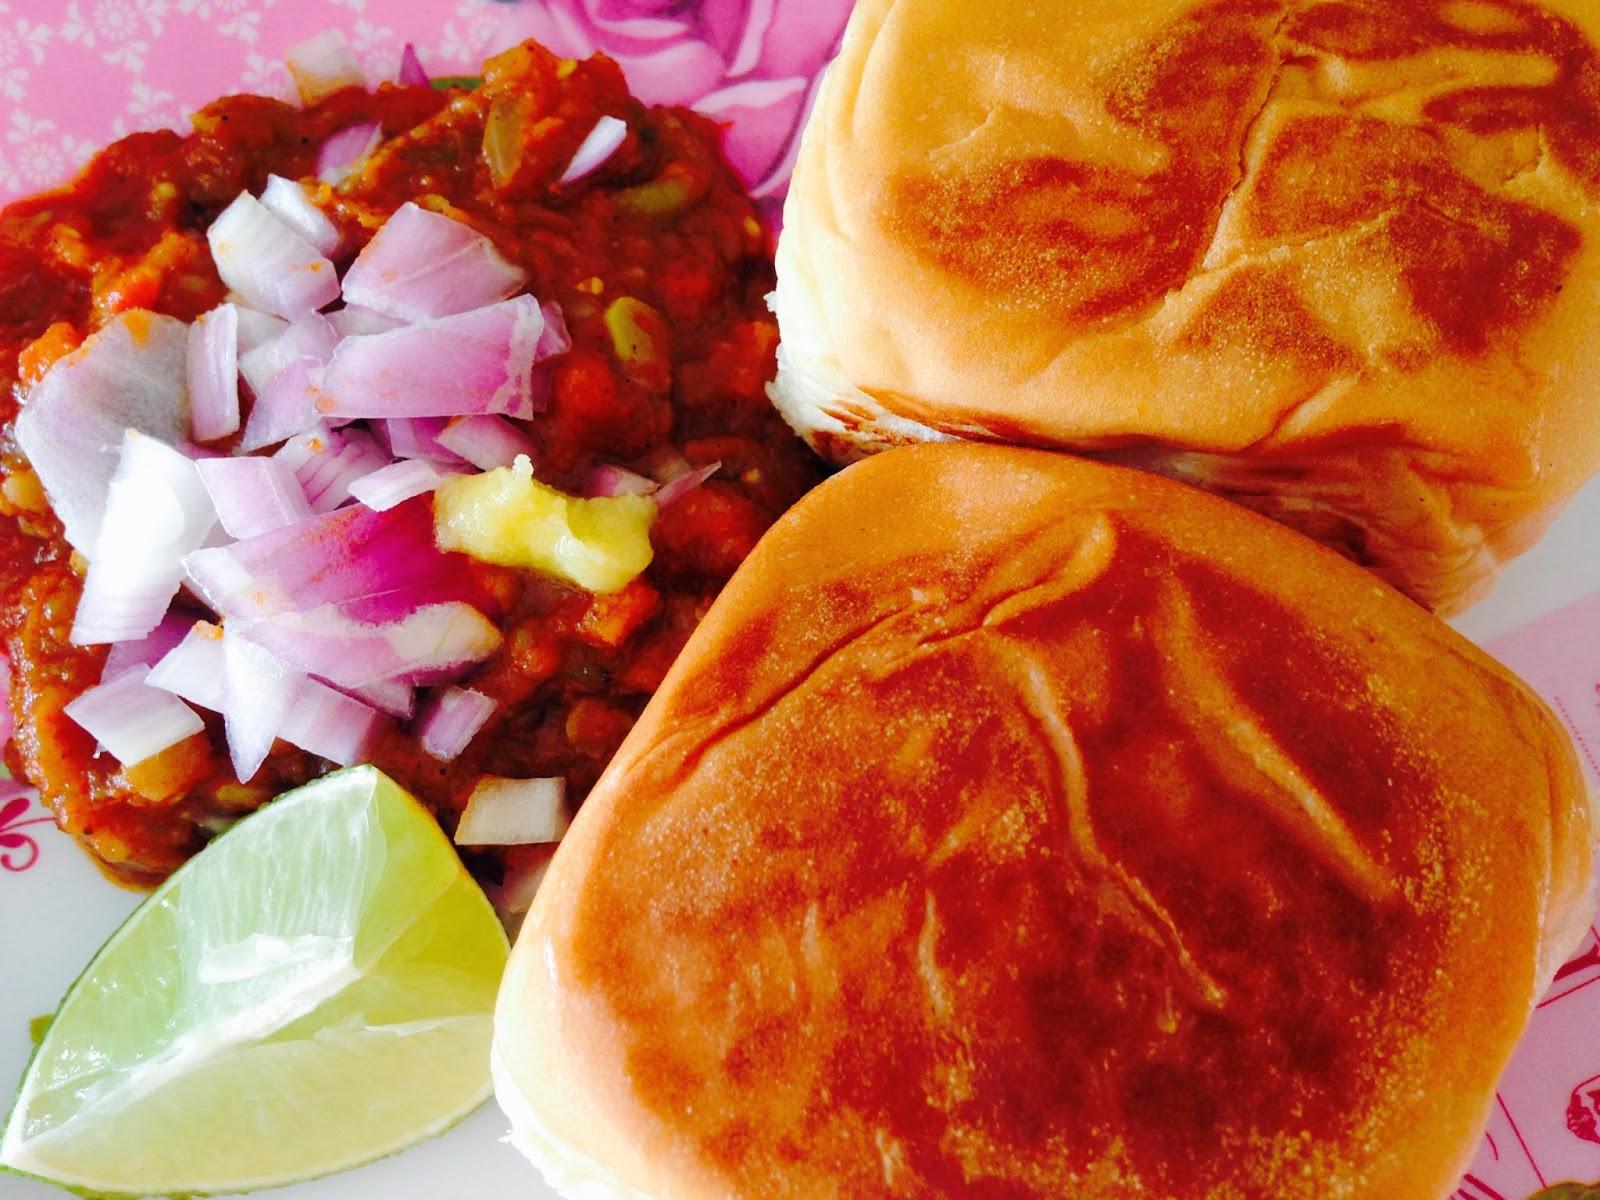 pav bhaji with gravy, onions, butter and lemon